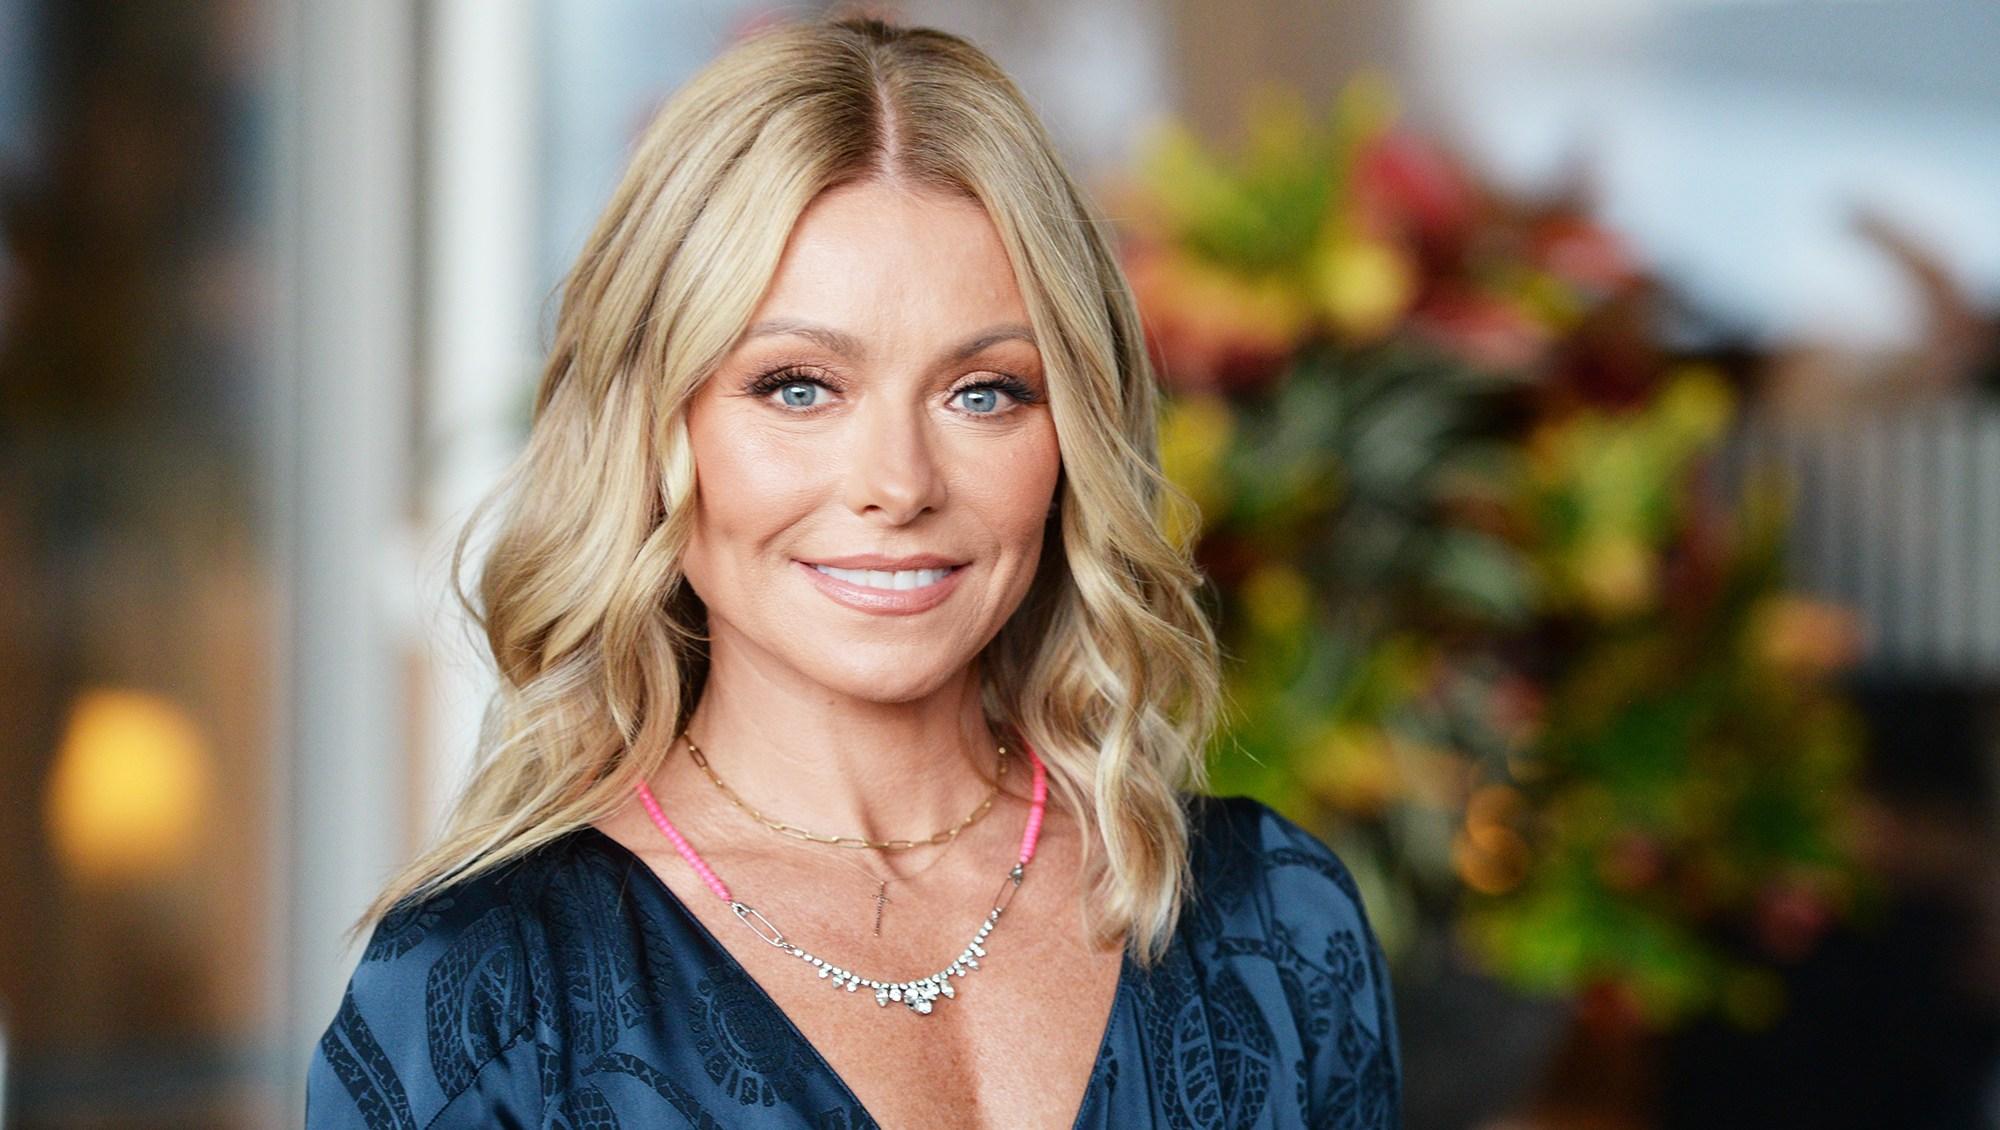 Kelly Ripa Is Shrugging Off 'Bachelor' Drama